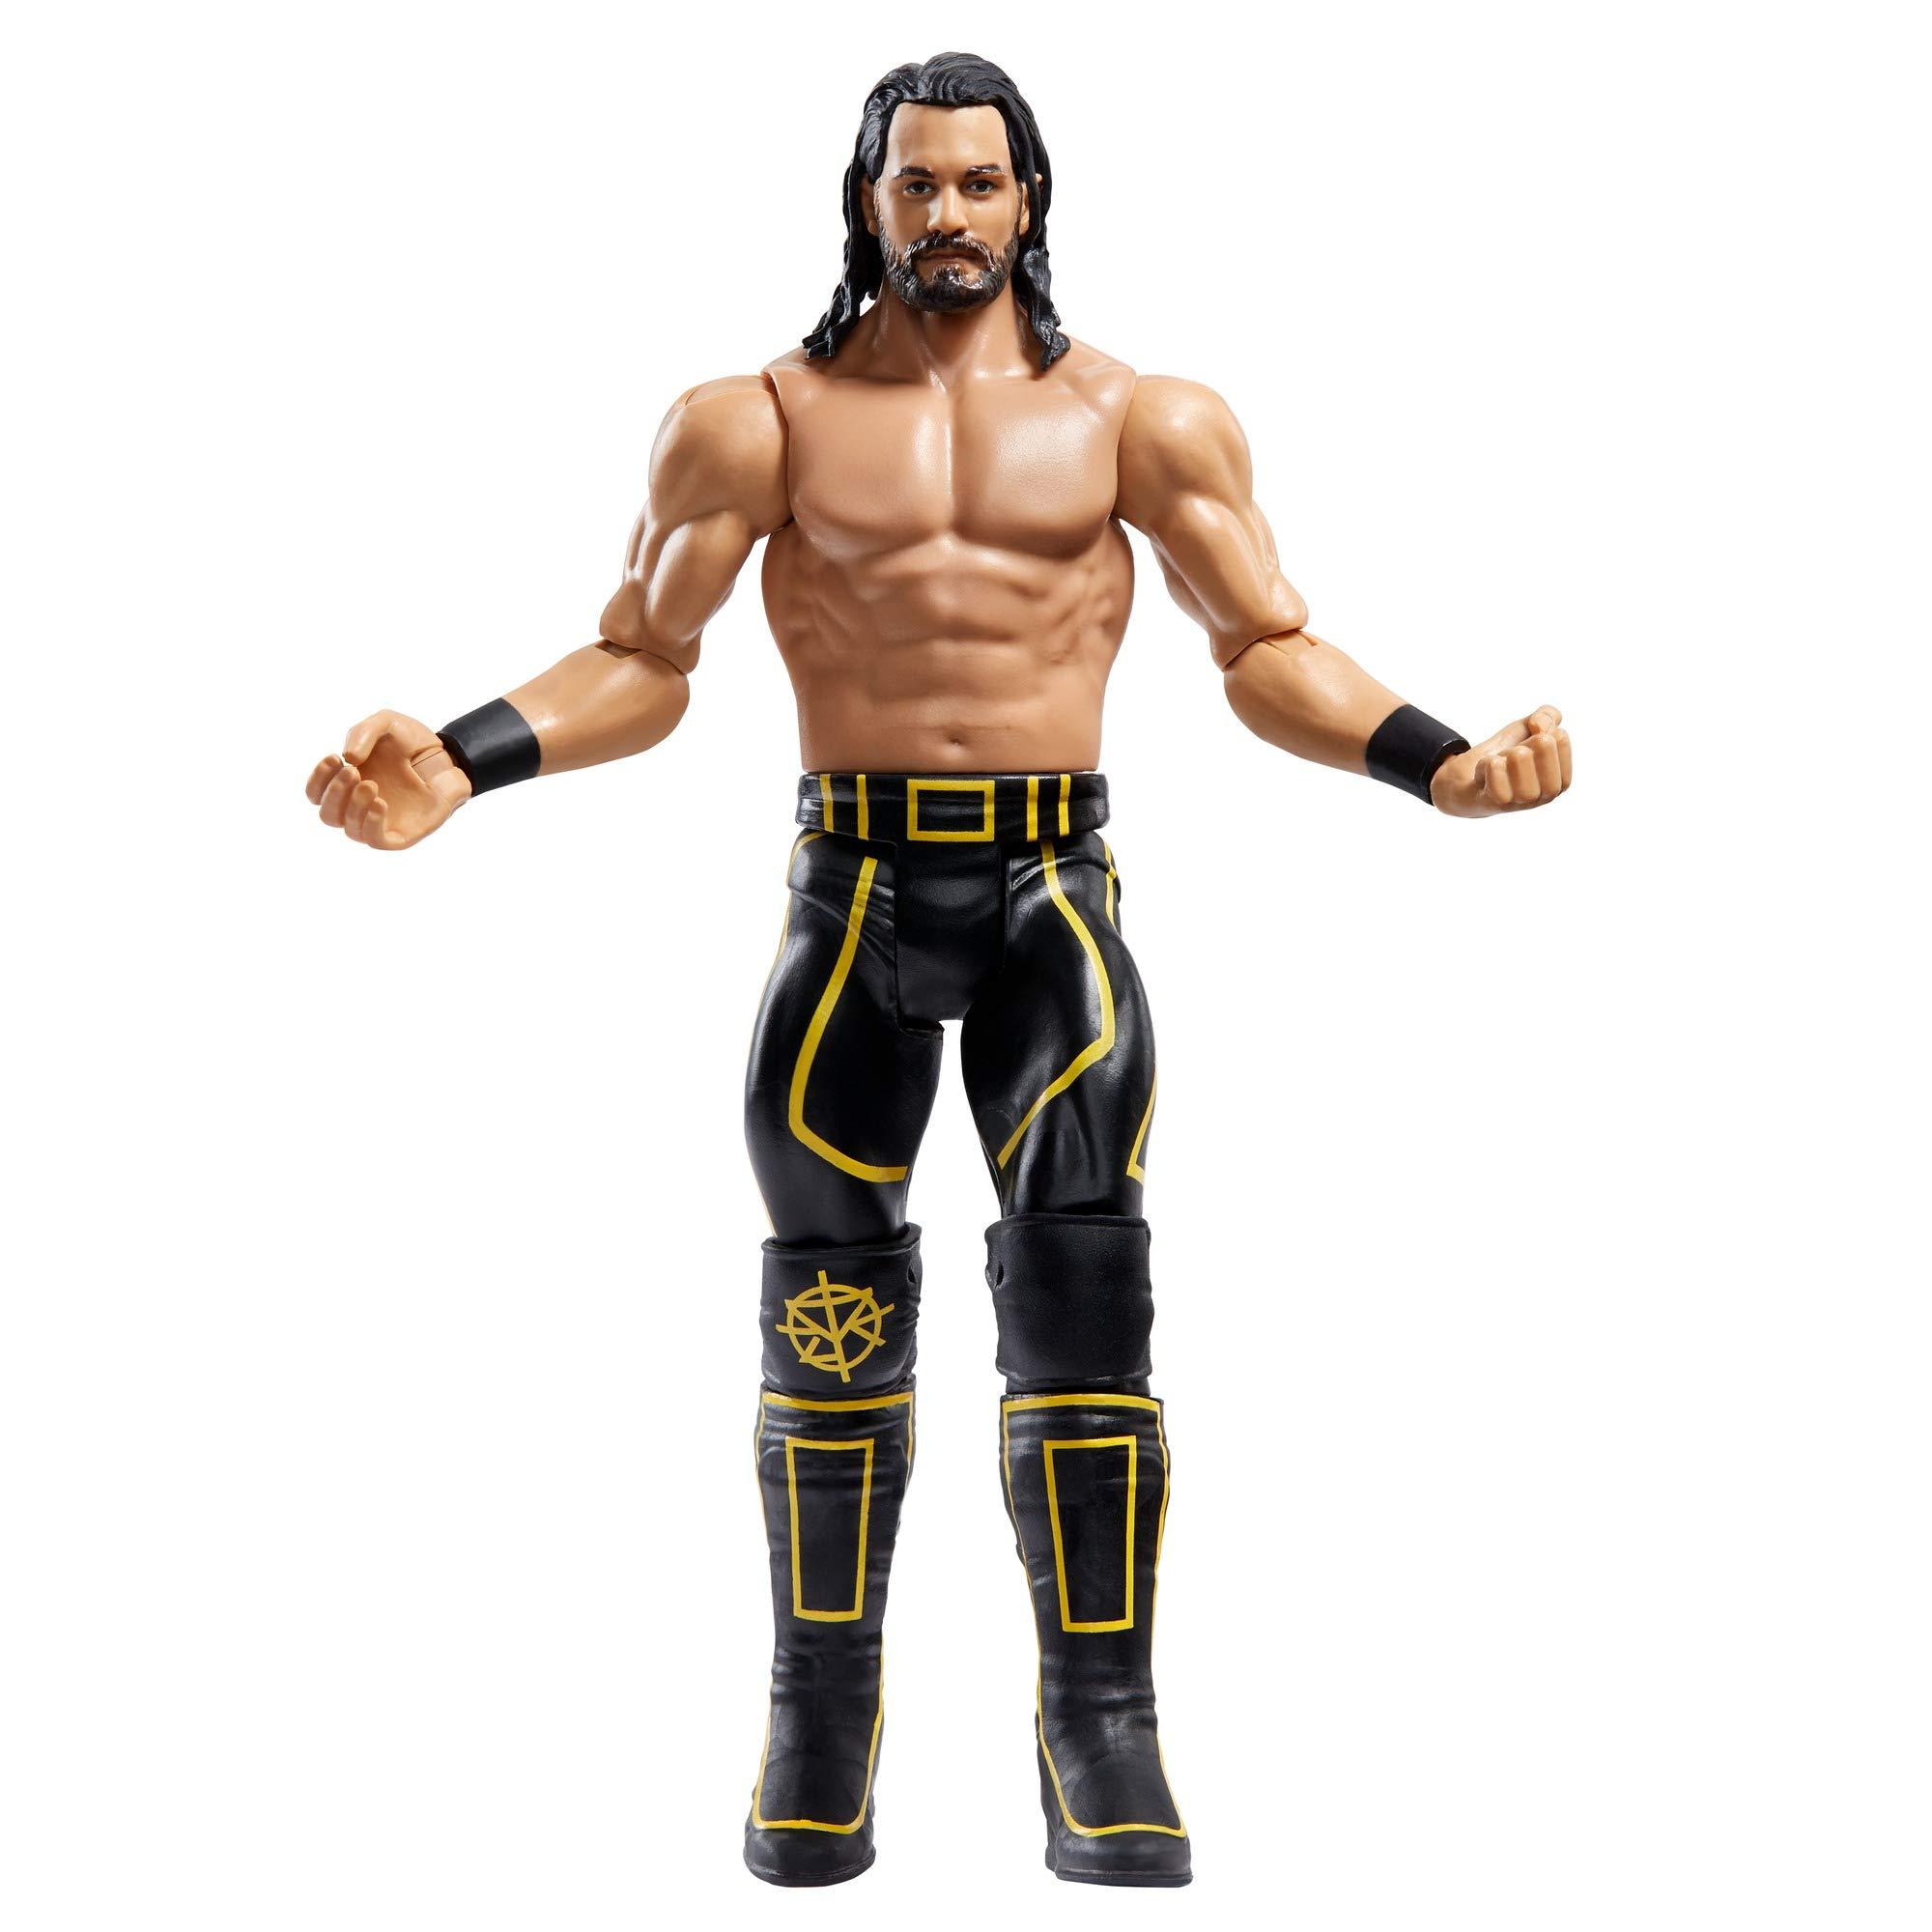 WWE MATTEL GKY56 WWE Seth Rollins Wrestlemania Action Figure